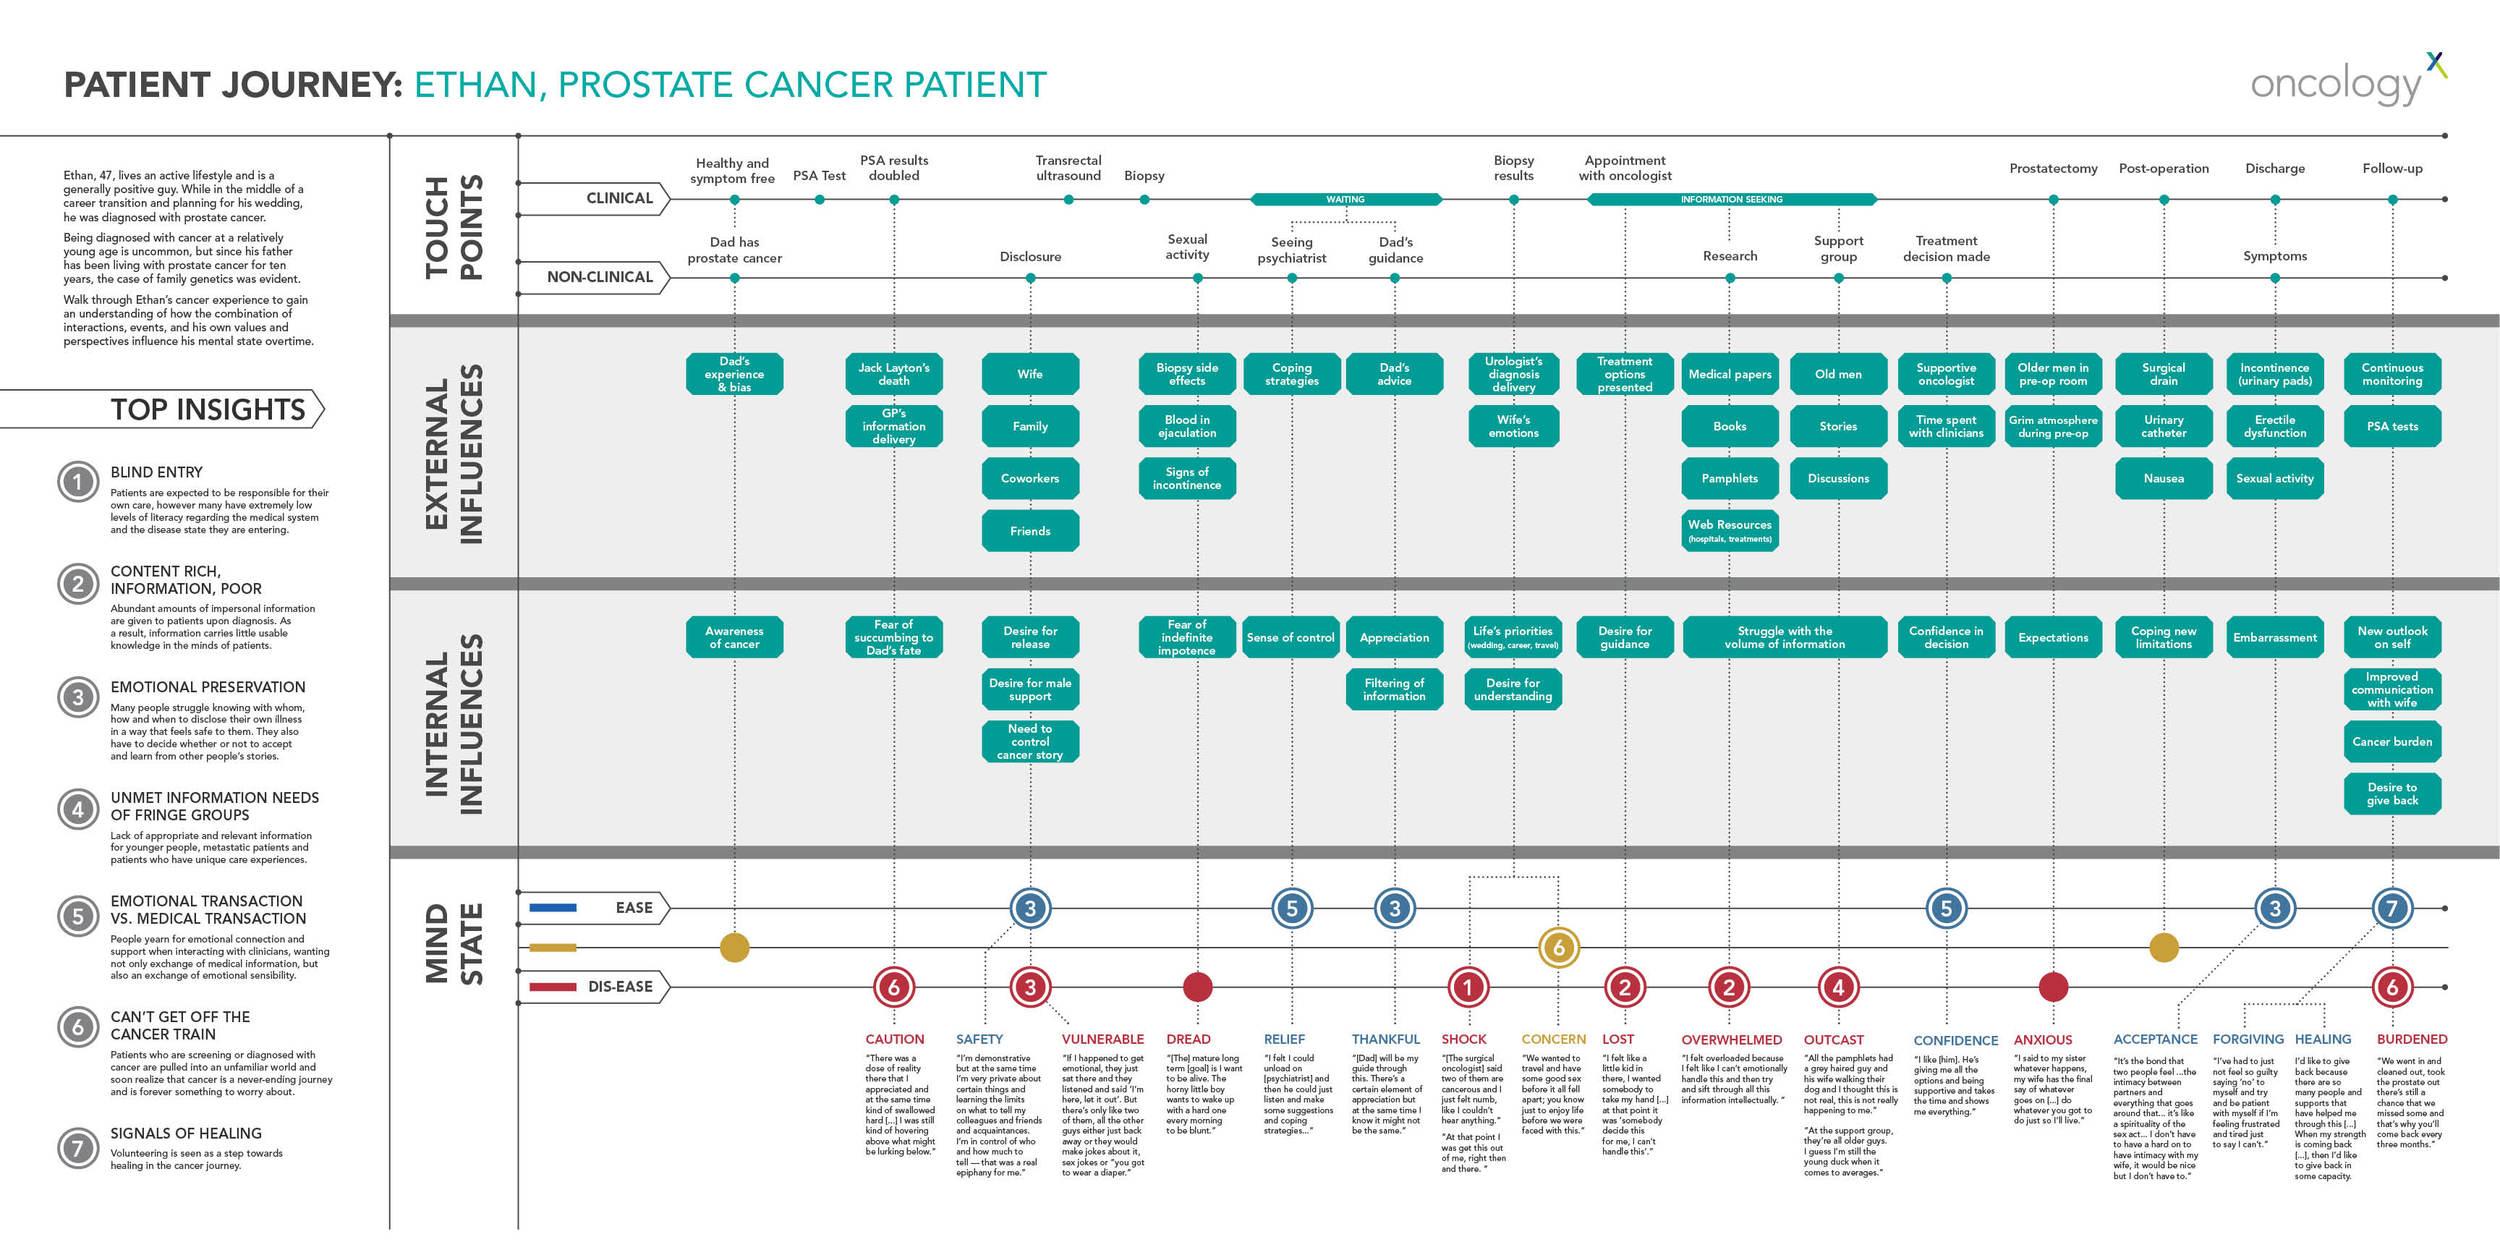 patientjourneymap_prostate